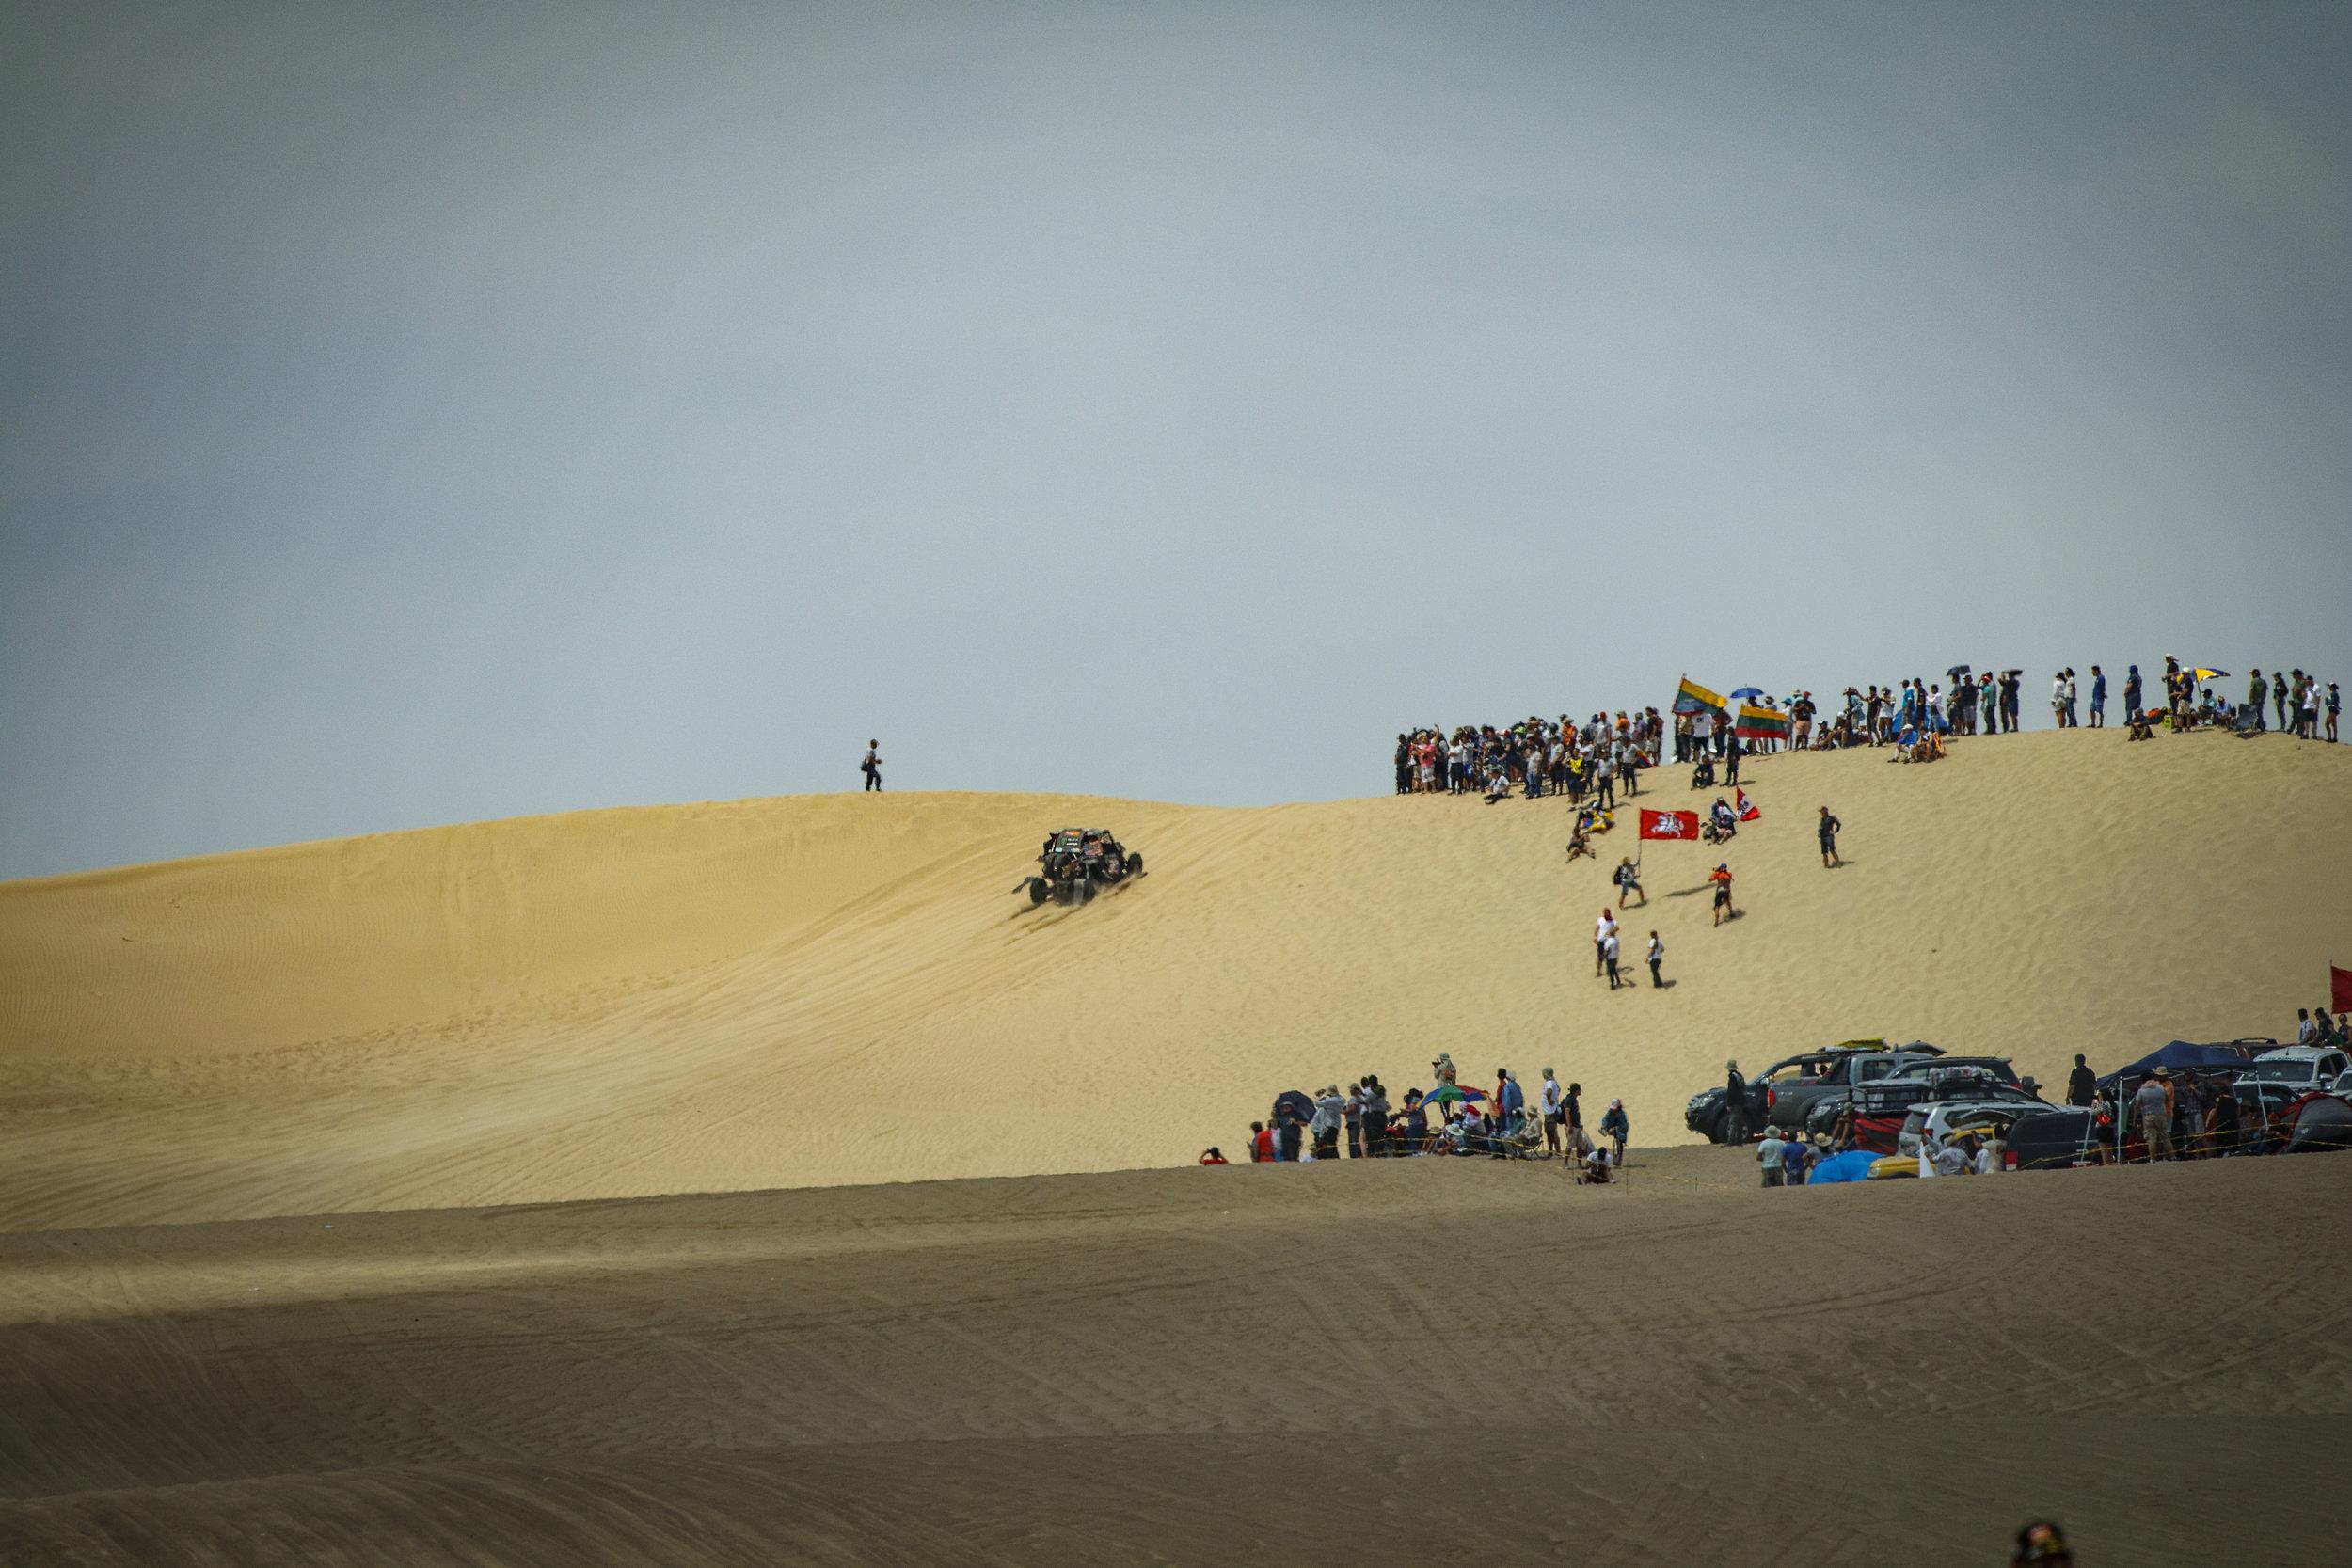 CaseyCurrie_Dakar_PiscoPeru_Stage1_CanAm_16X9_003.jpg